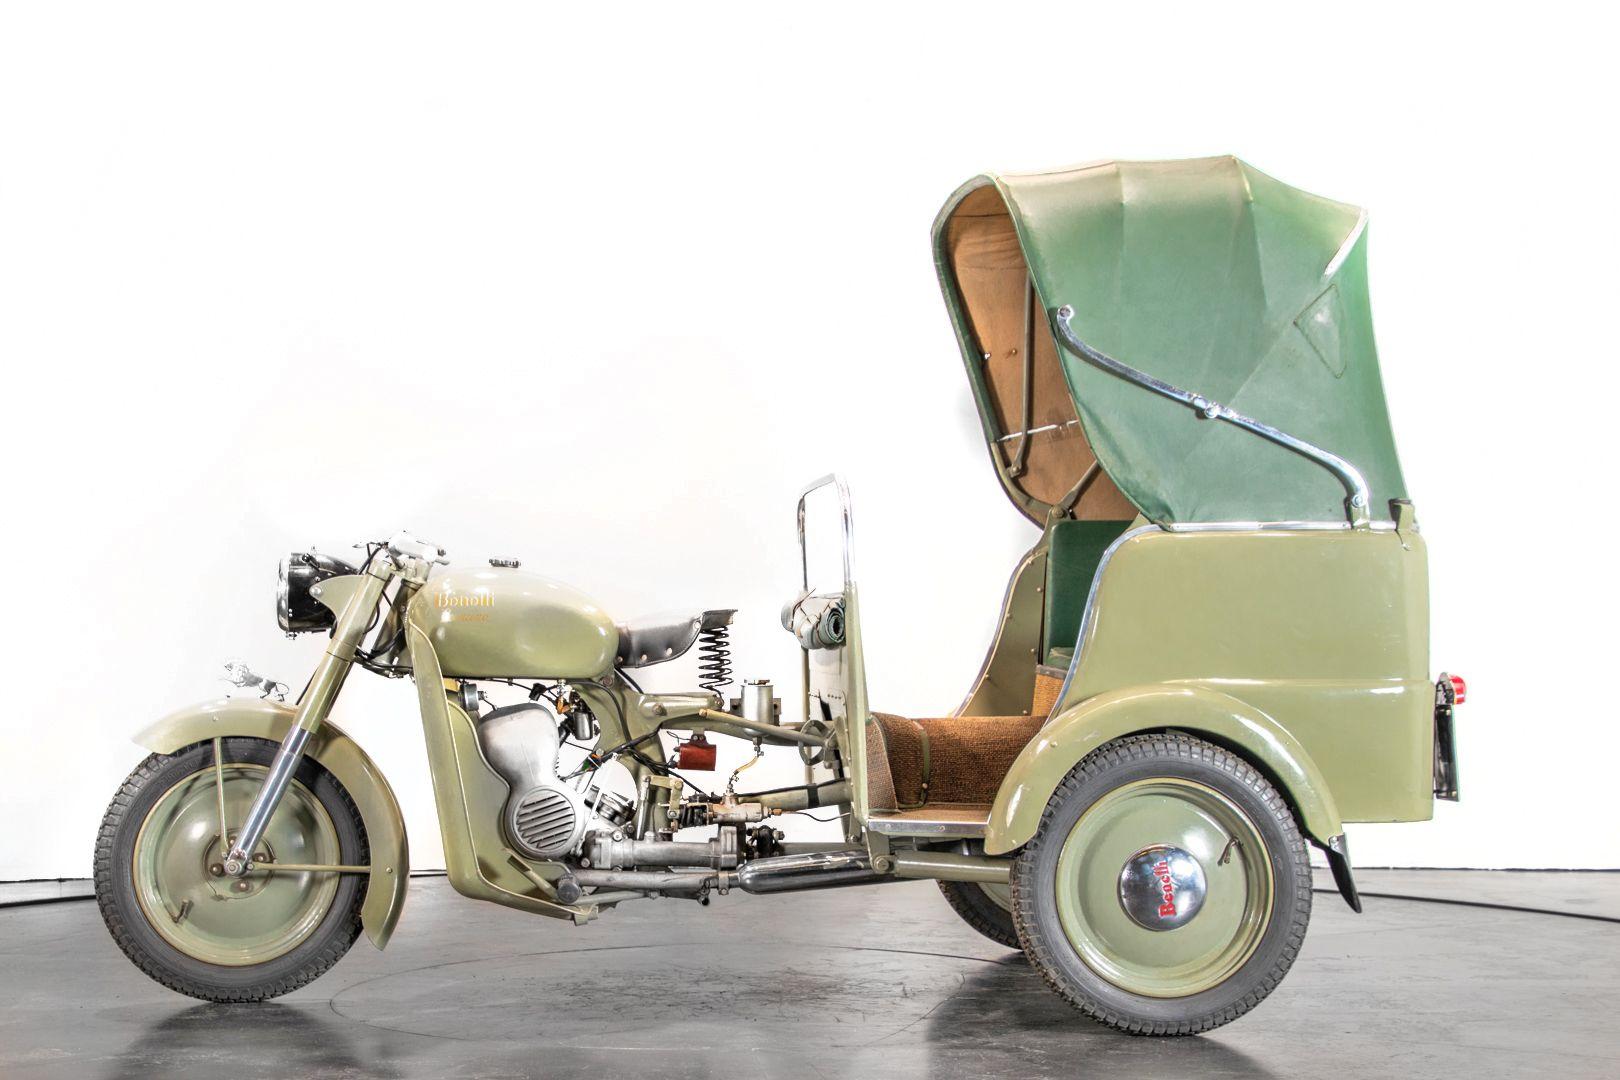 1956 Benelli 125 Leoncino Rikshaws 74322